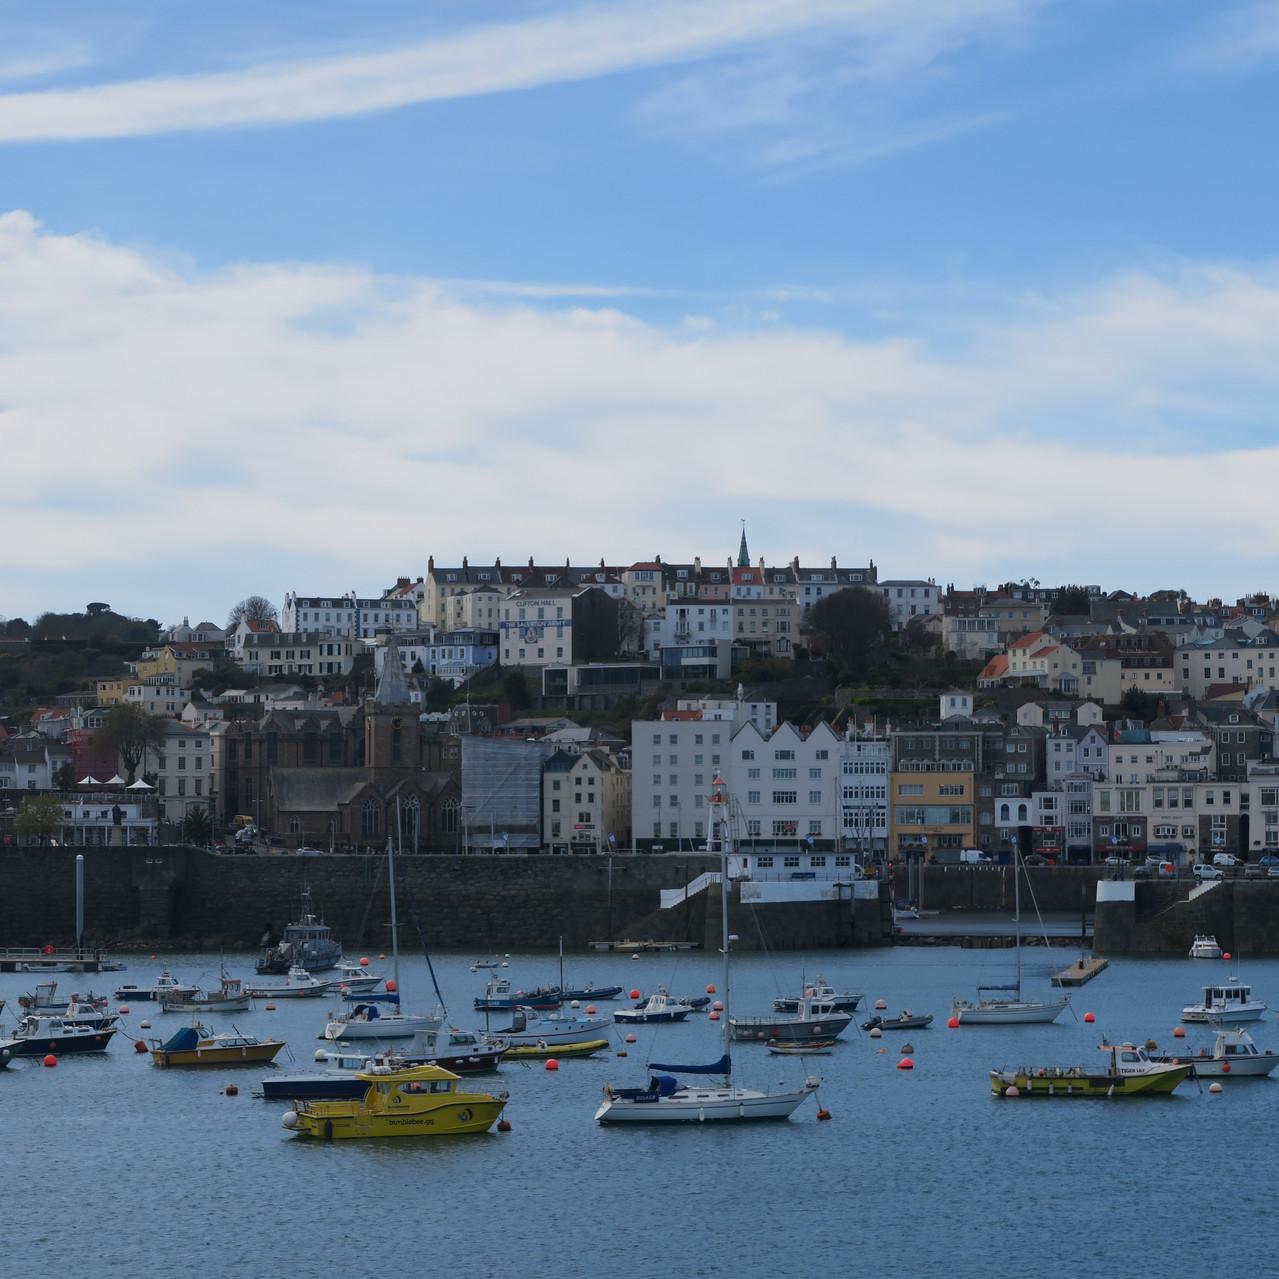 Leaving Guernsey